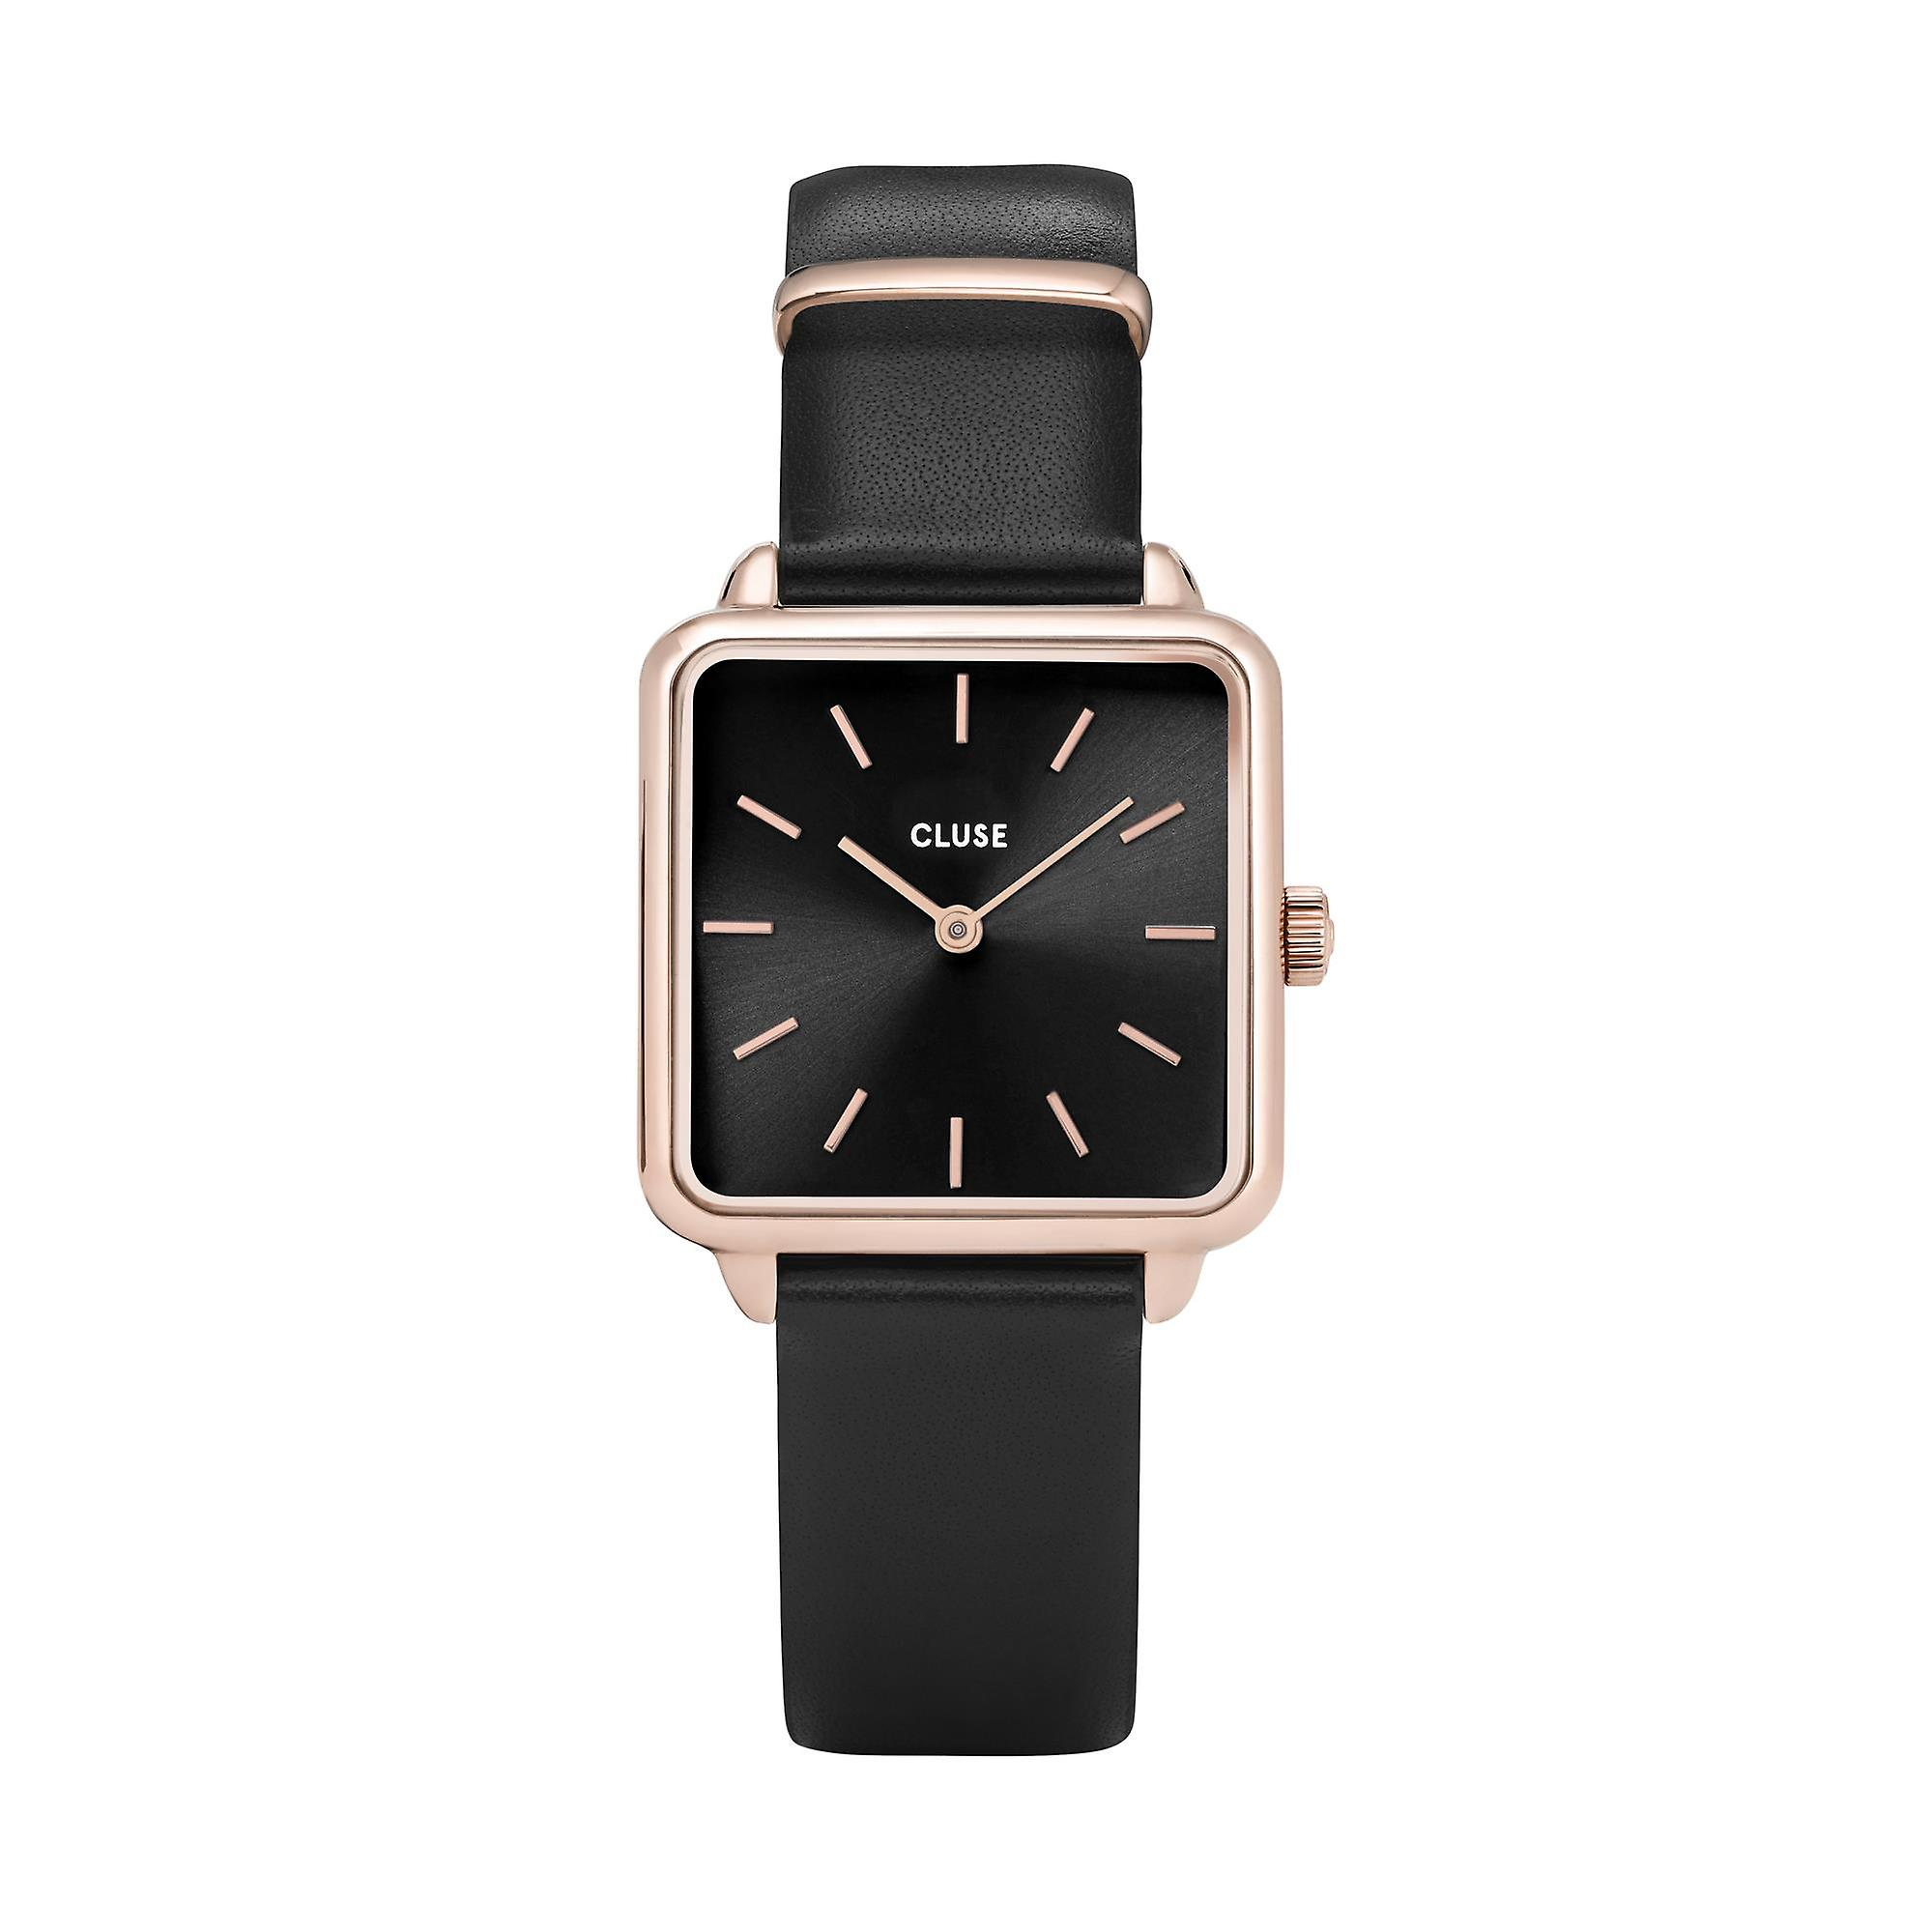 CLUSE La Tetragone Square Dial Rose Gold PVD Case Black Leather Strap Ladies Watch CW0101207011